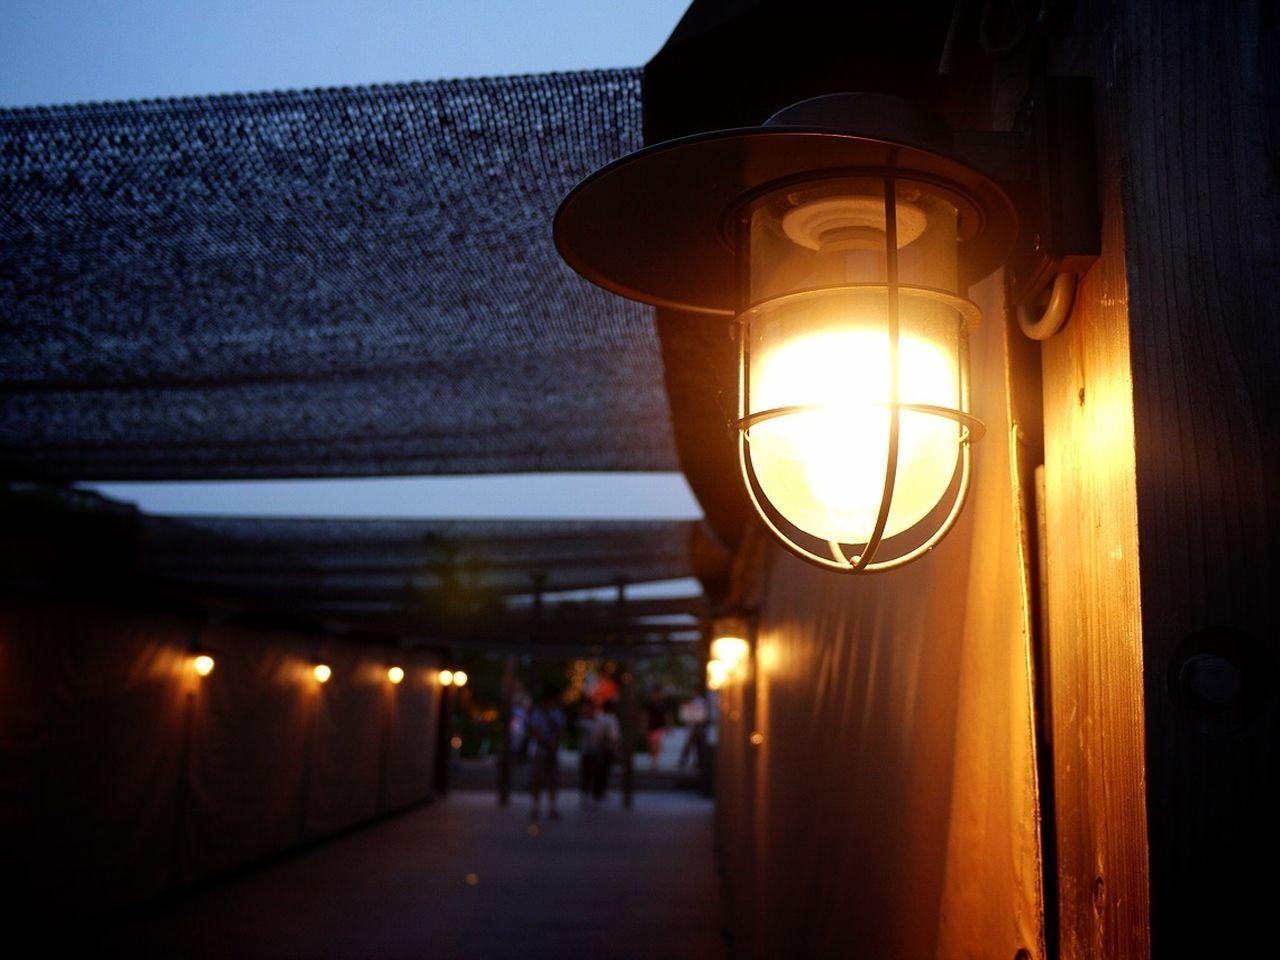 Close-up of illuminated electric lamp outdoors